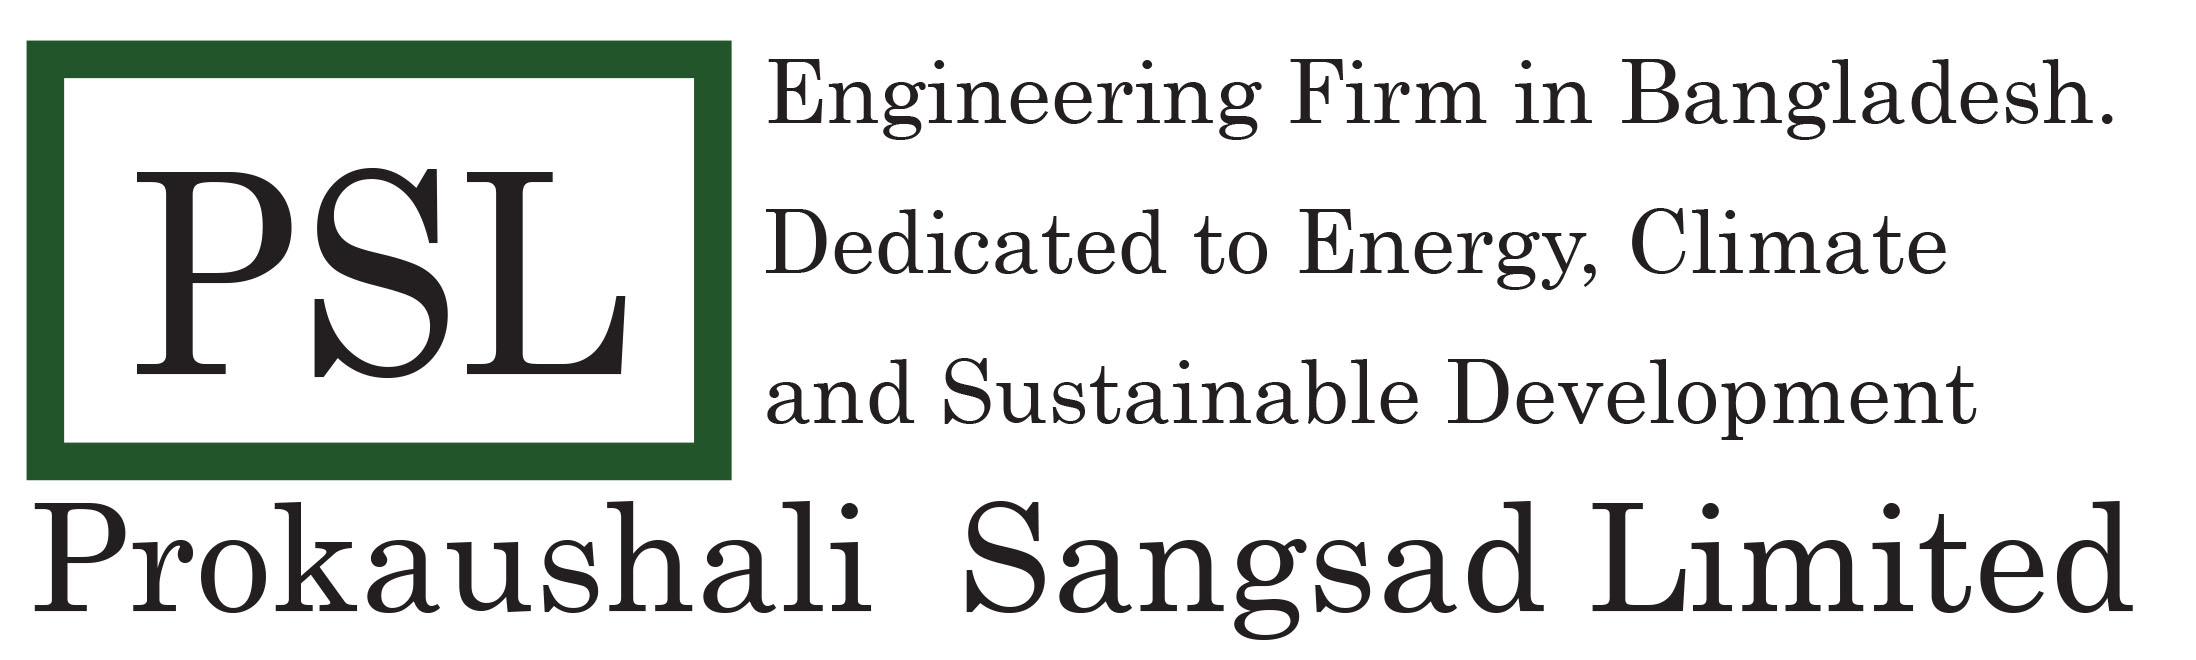 Prokaushali Sangsad Limited (PSL)